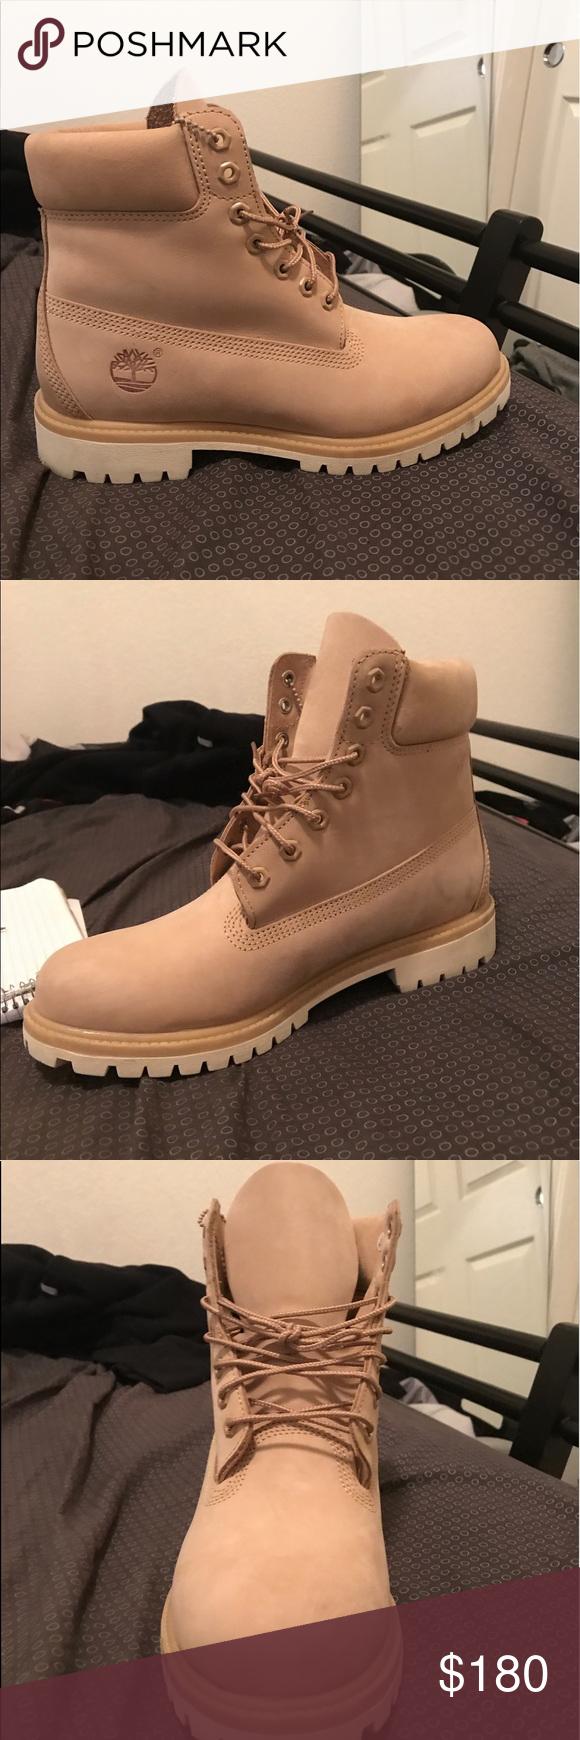 Timberland boot creme size 9 mens